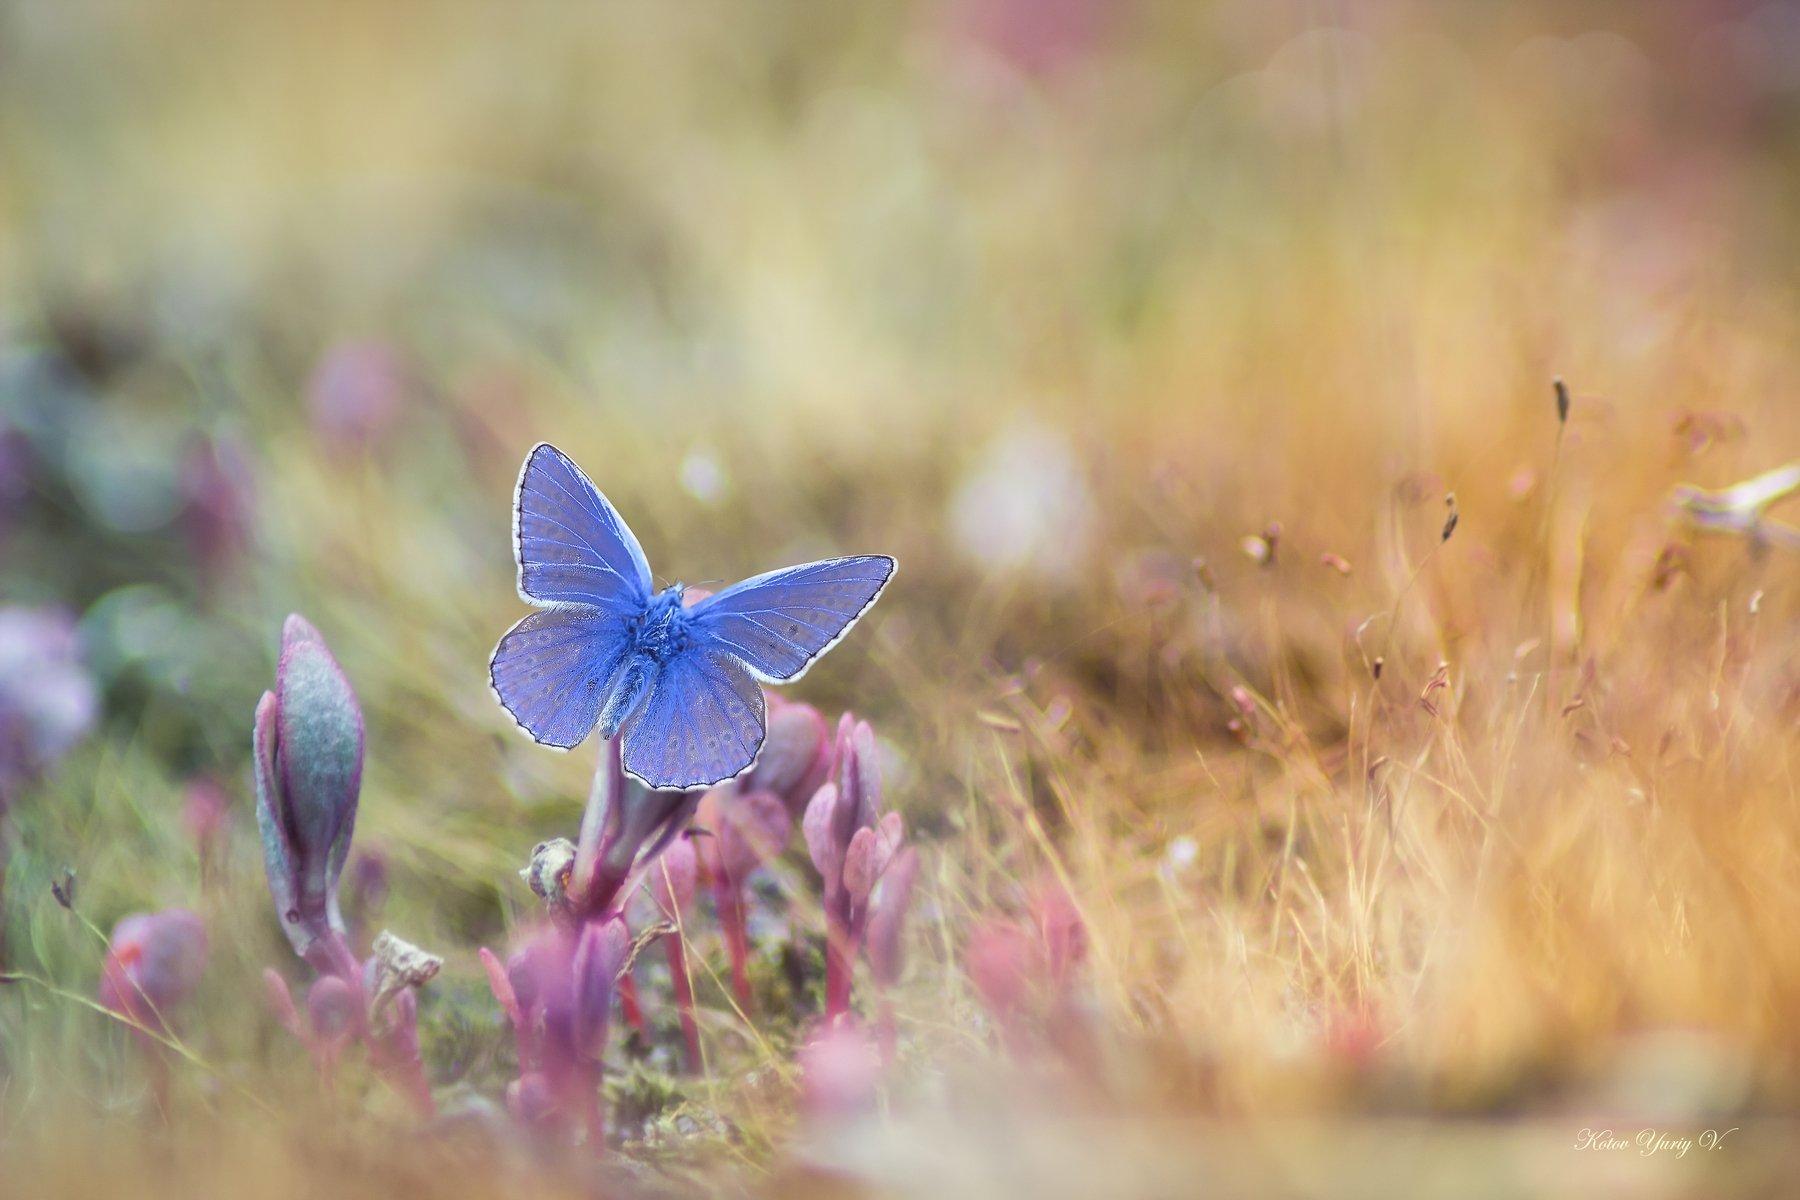 Бабочка, Крылья, Мох, Свет, Трава, Котов Юрий